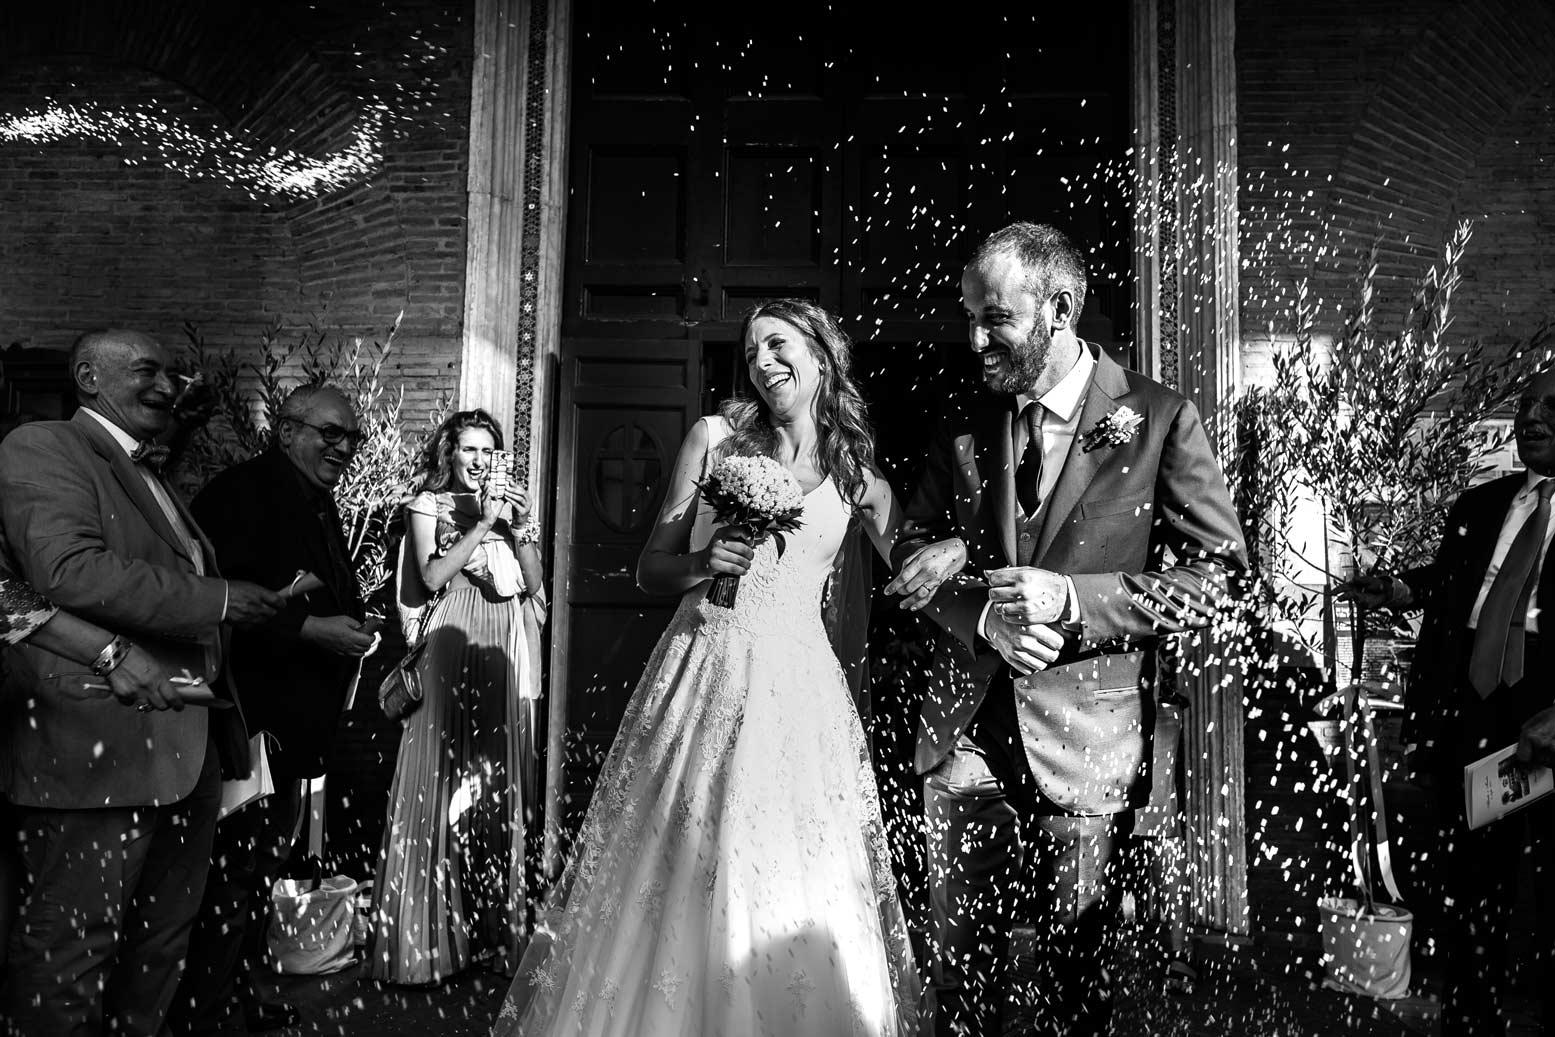 Fotografo-Per-Matrimonio-Roma-Reportage-Cerimonia